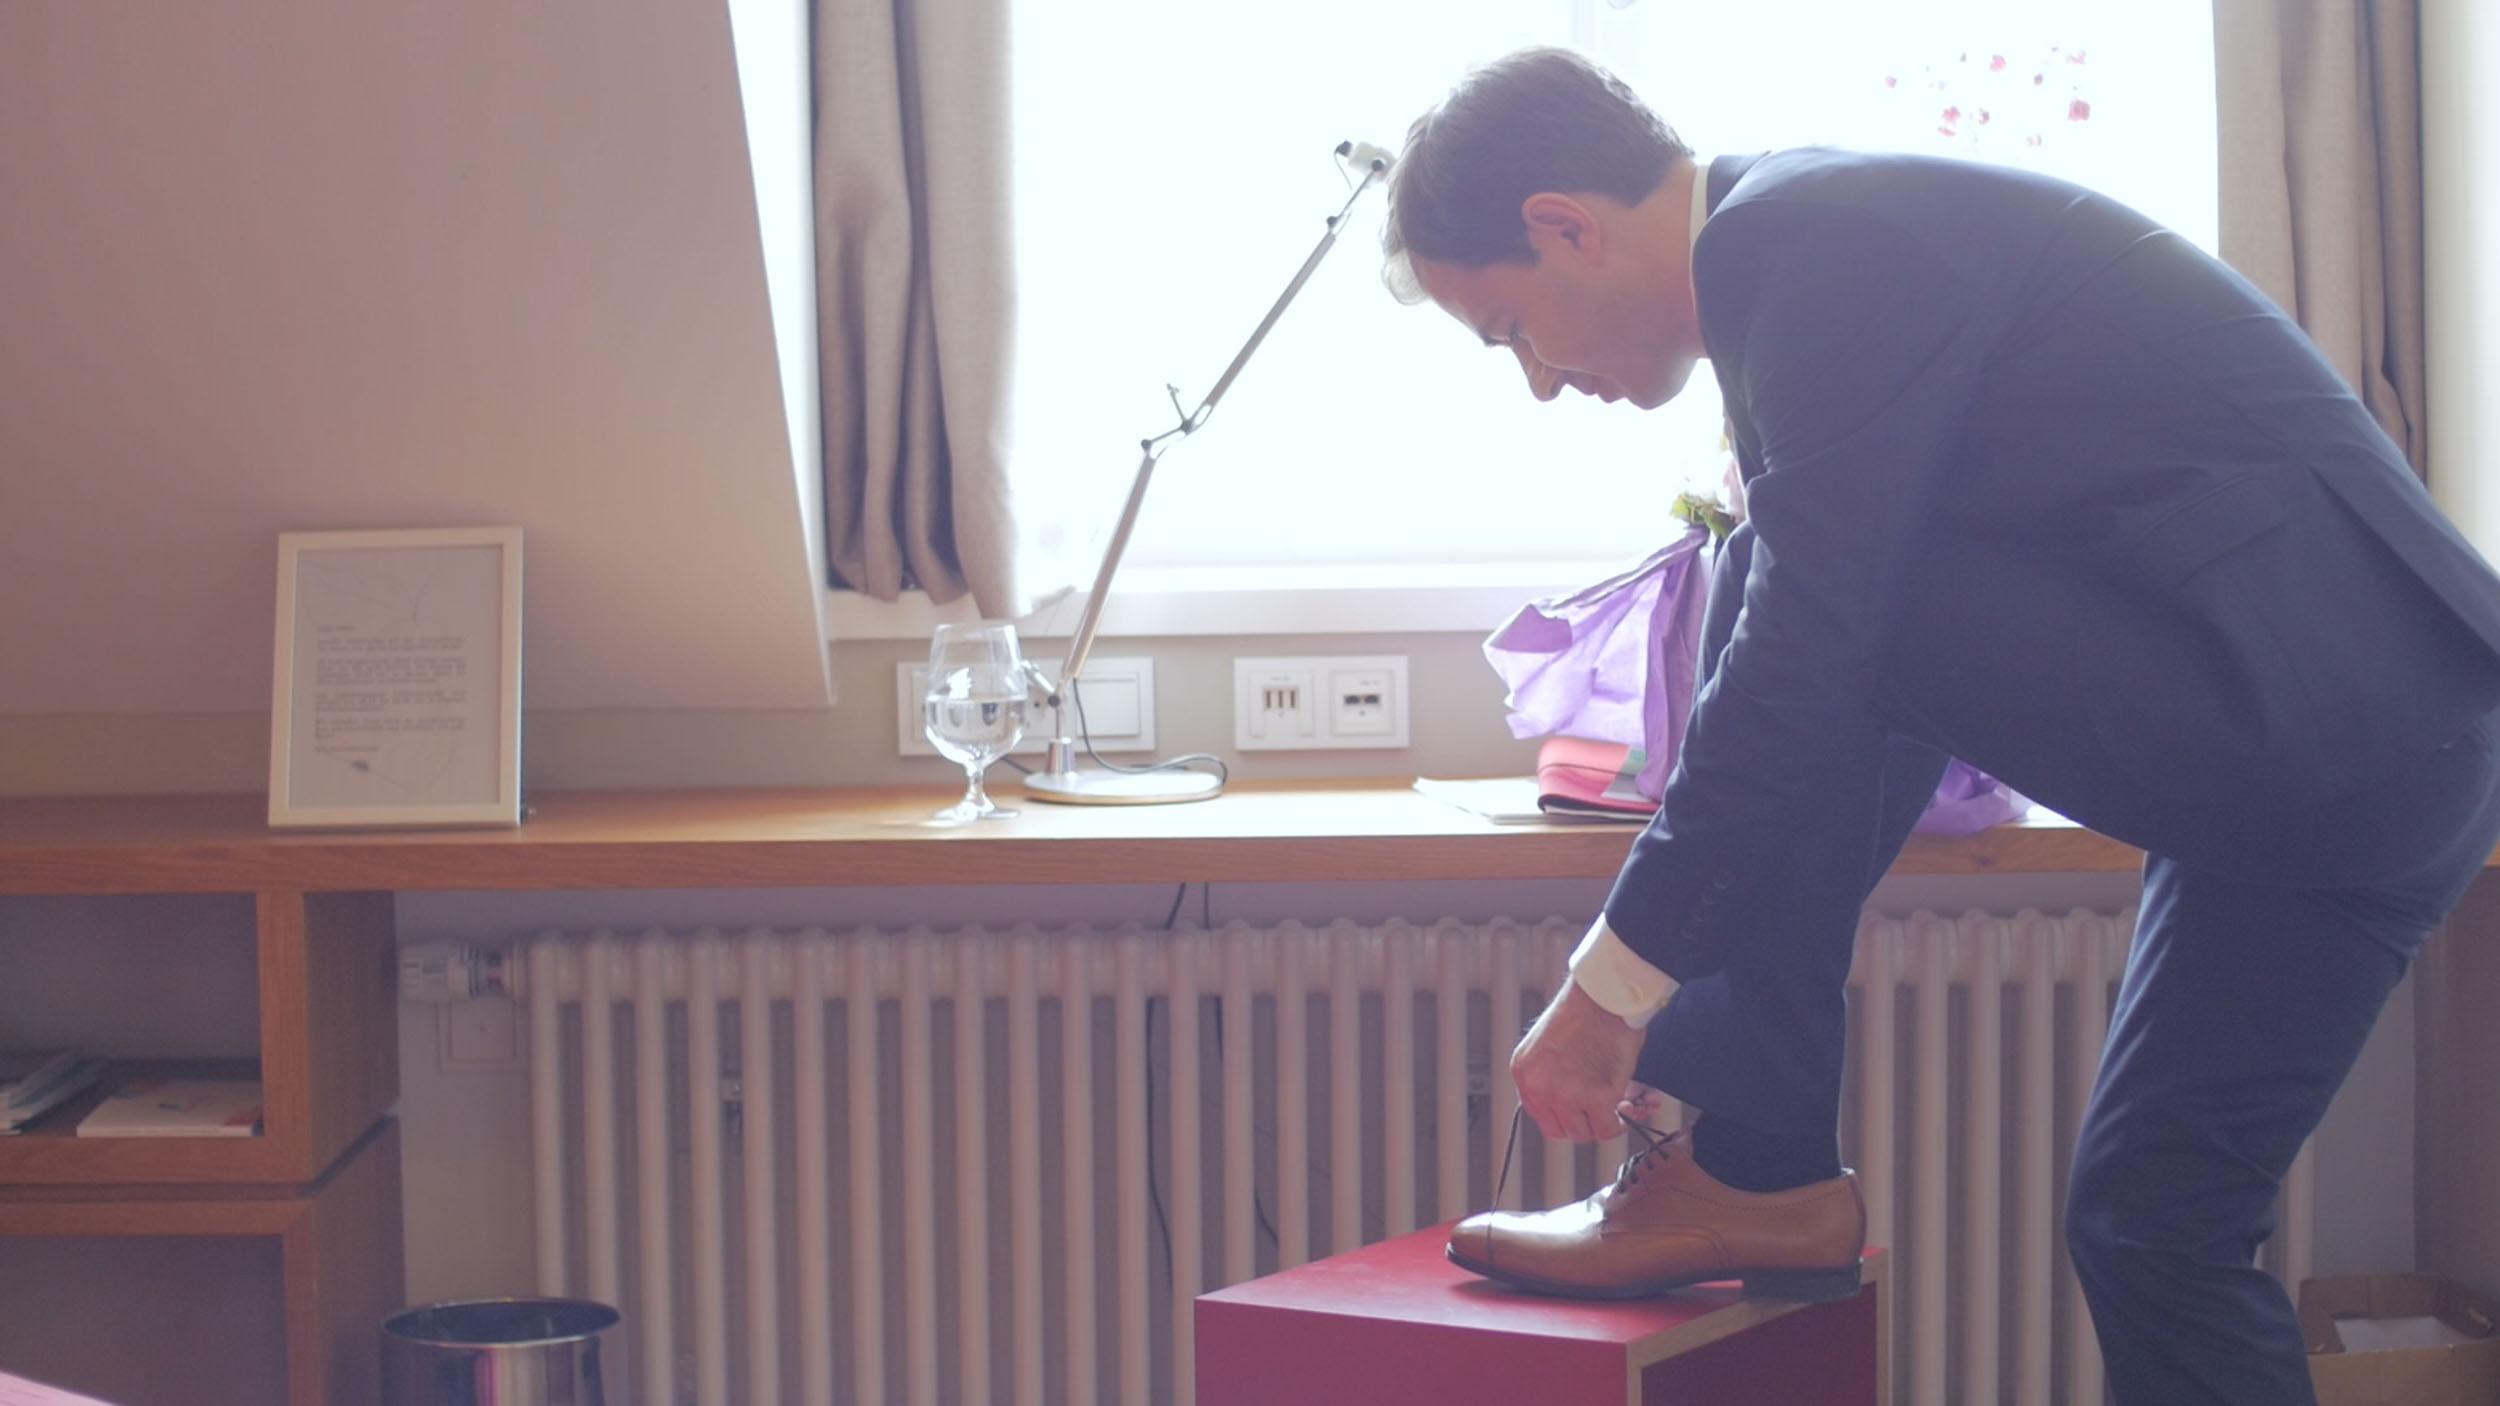 Hochzeitsvideo-trailer-Ehemann-schuhe-screenshot-zammgfasst-fotograf.jpg